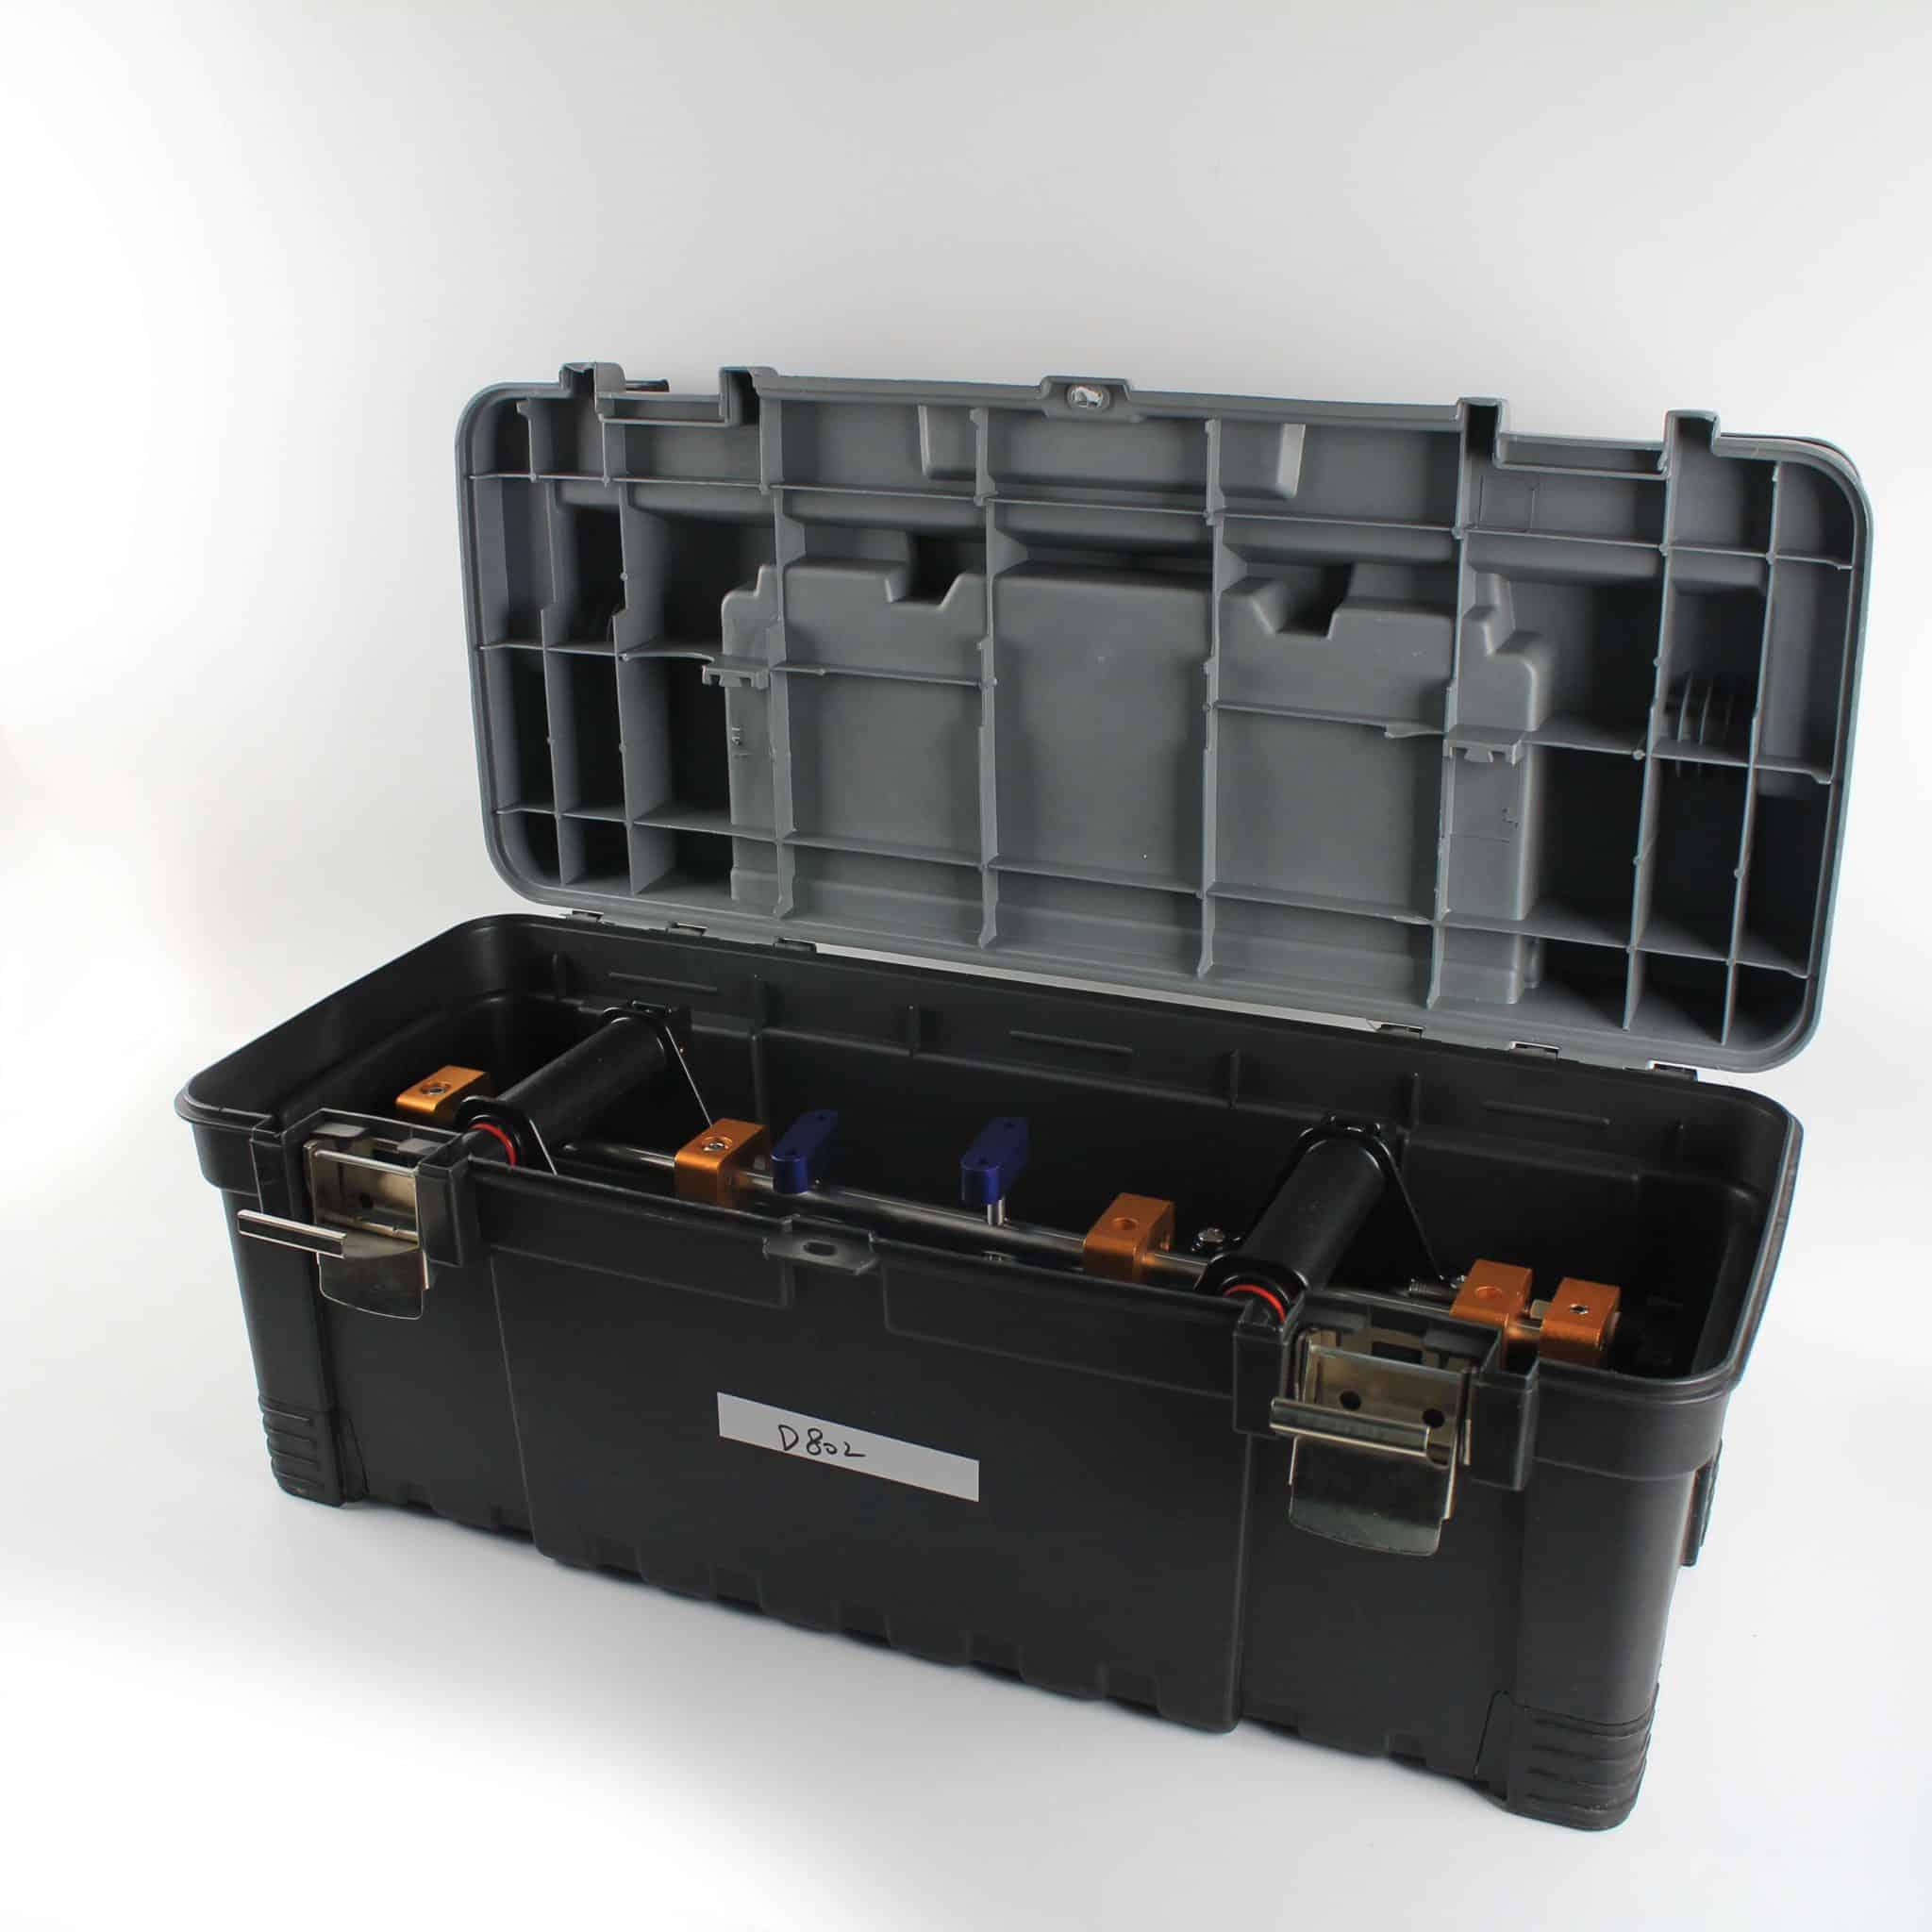 Raizi 2 Pcs 90 degree 8 Inch Waterfall Seam Setter Granite Countertop With Professional Case Manual Installation Tools